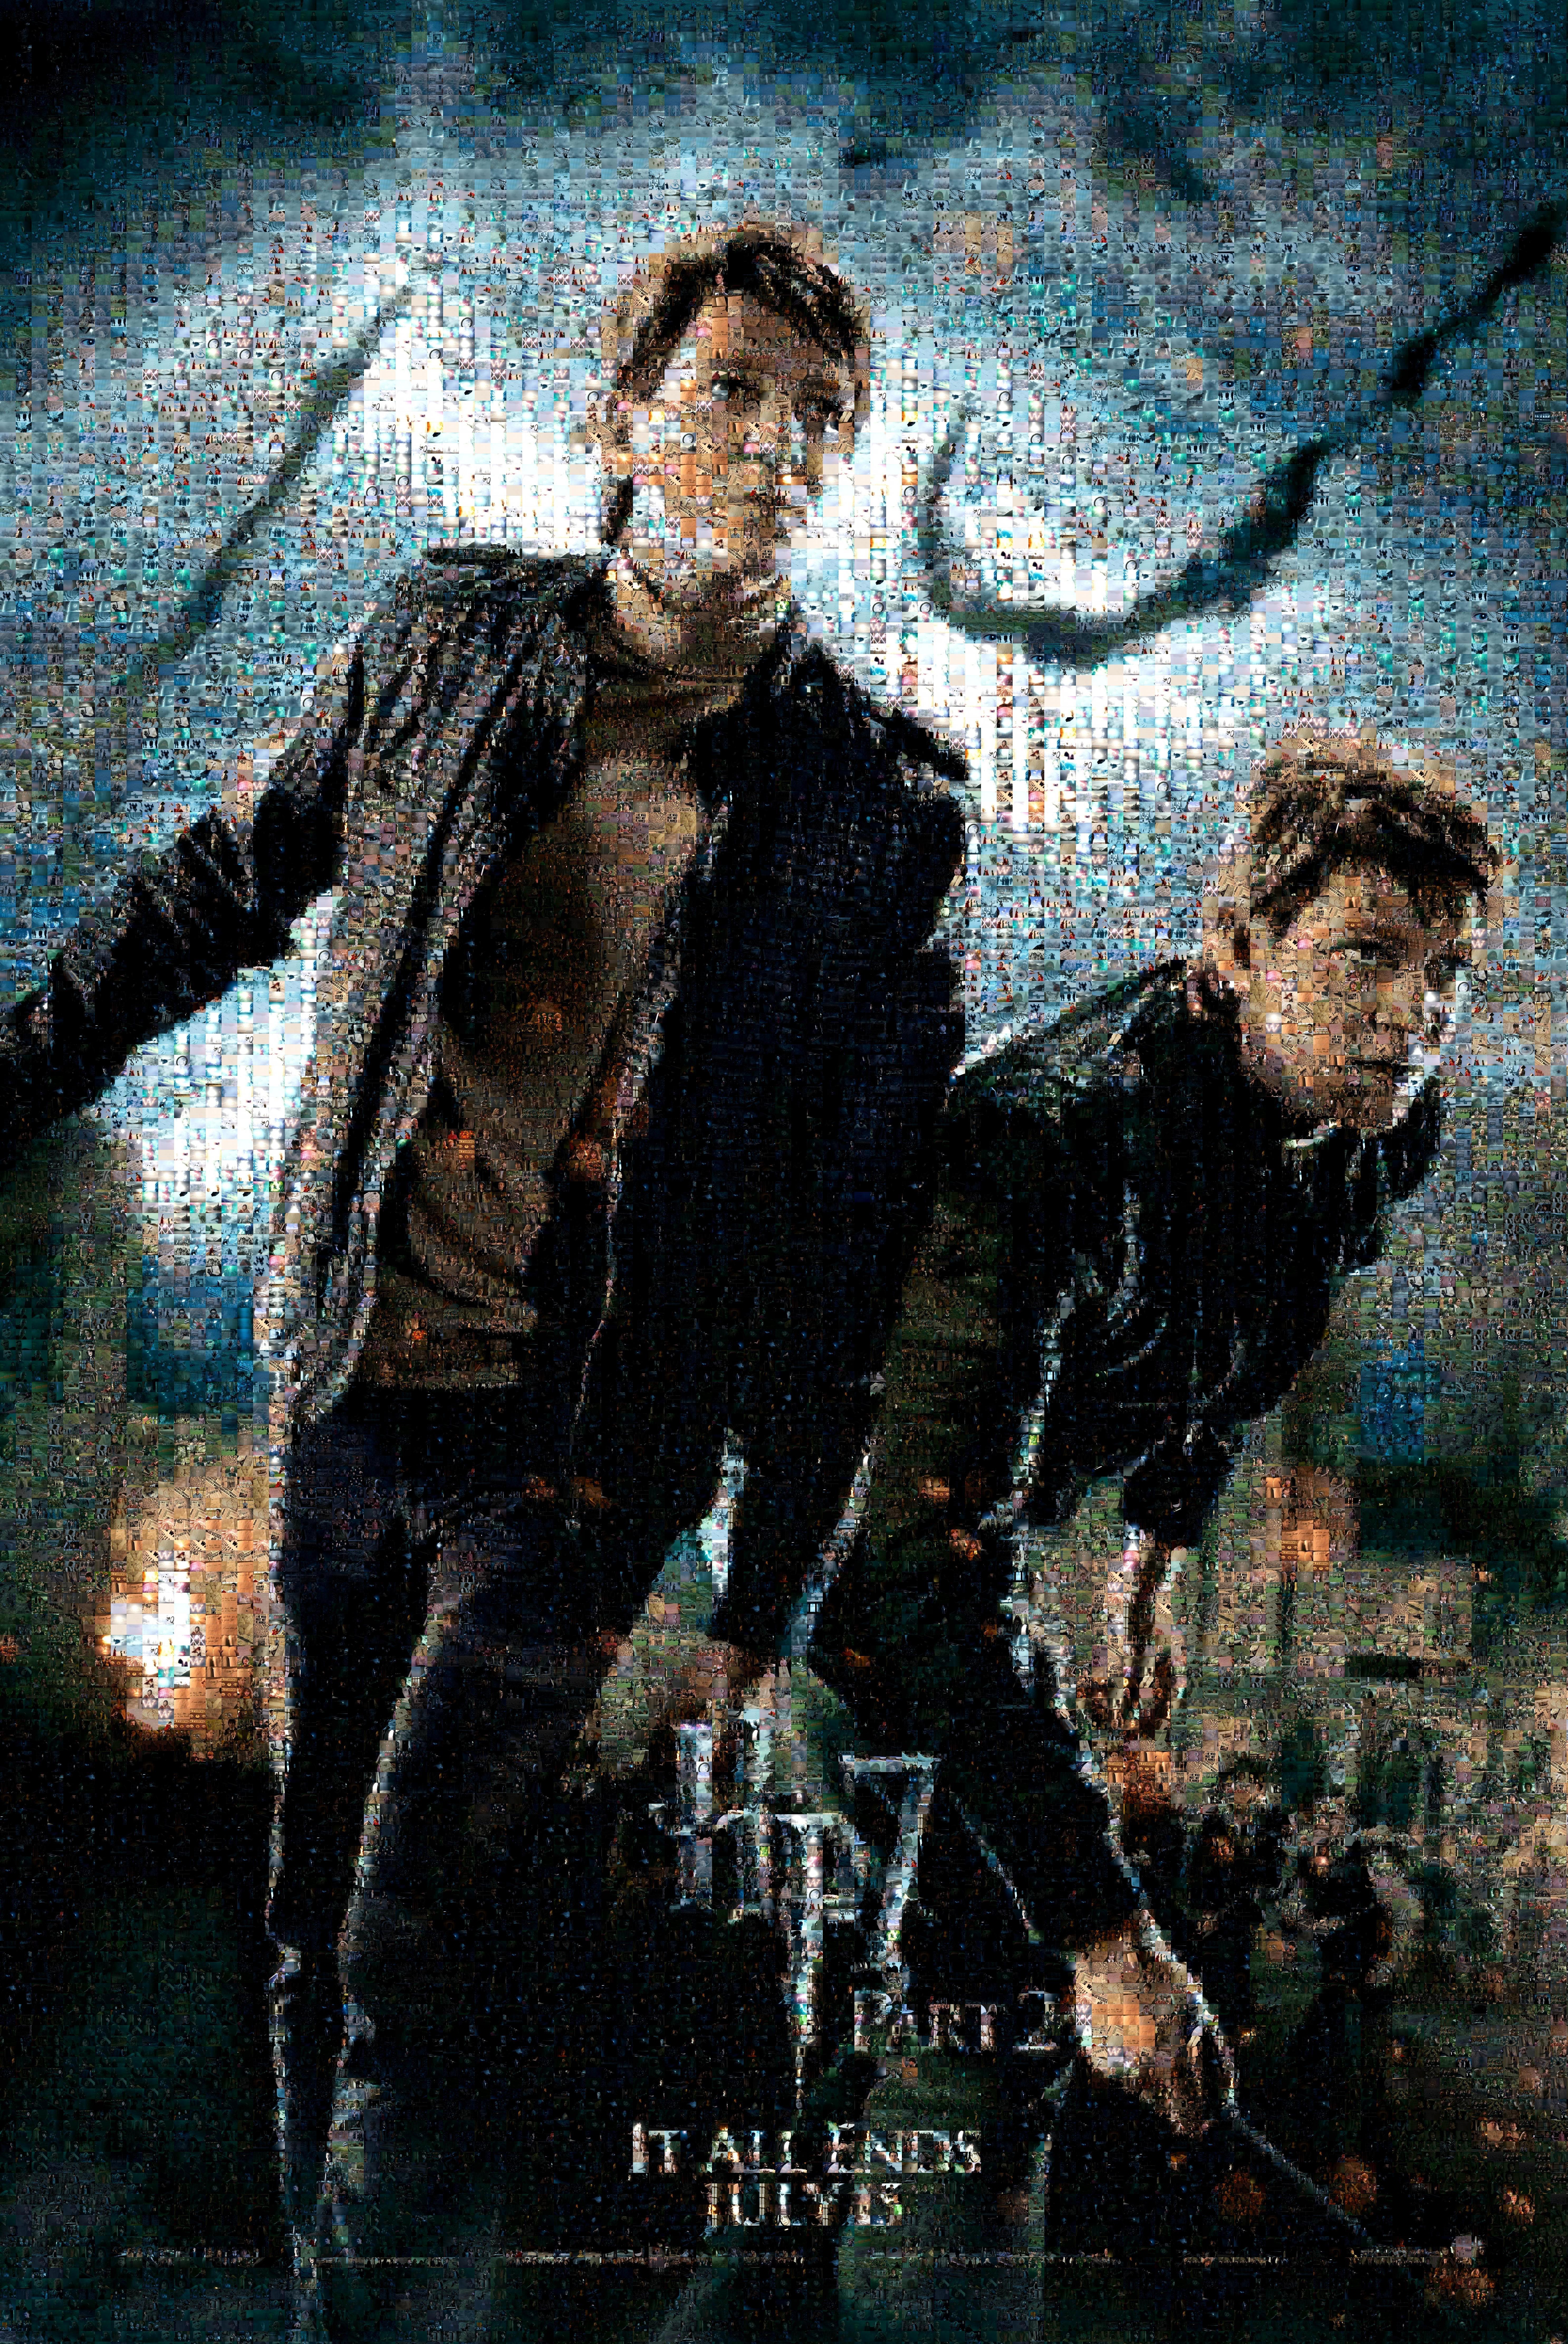 HP7 Weasley Twins Mosaic Movie